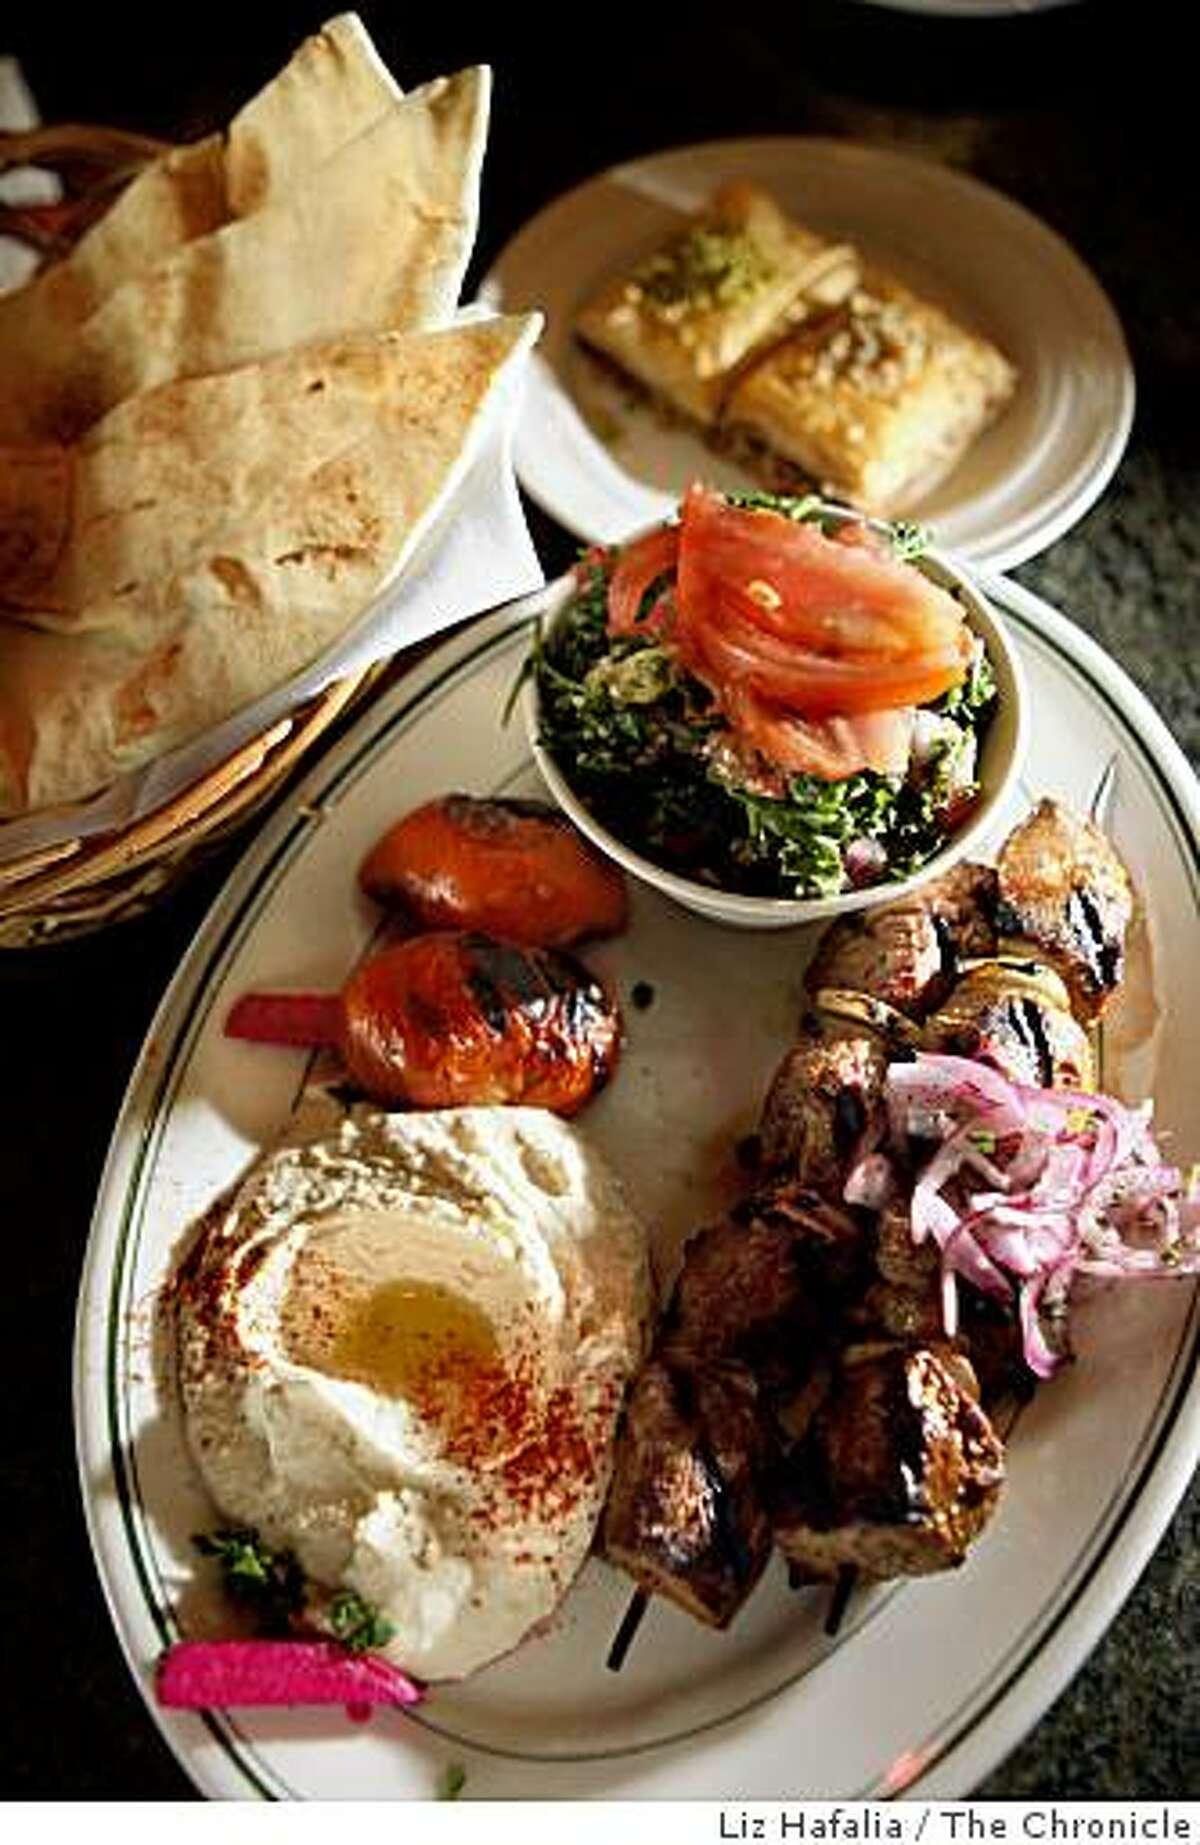 Hummus, lamb shish kebob, tabouli, and baklava at Sinbad Restaurant and Grill in San Mateo, Calif., on Friday, August 8, 2008.